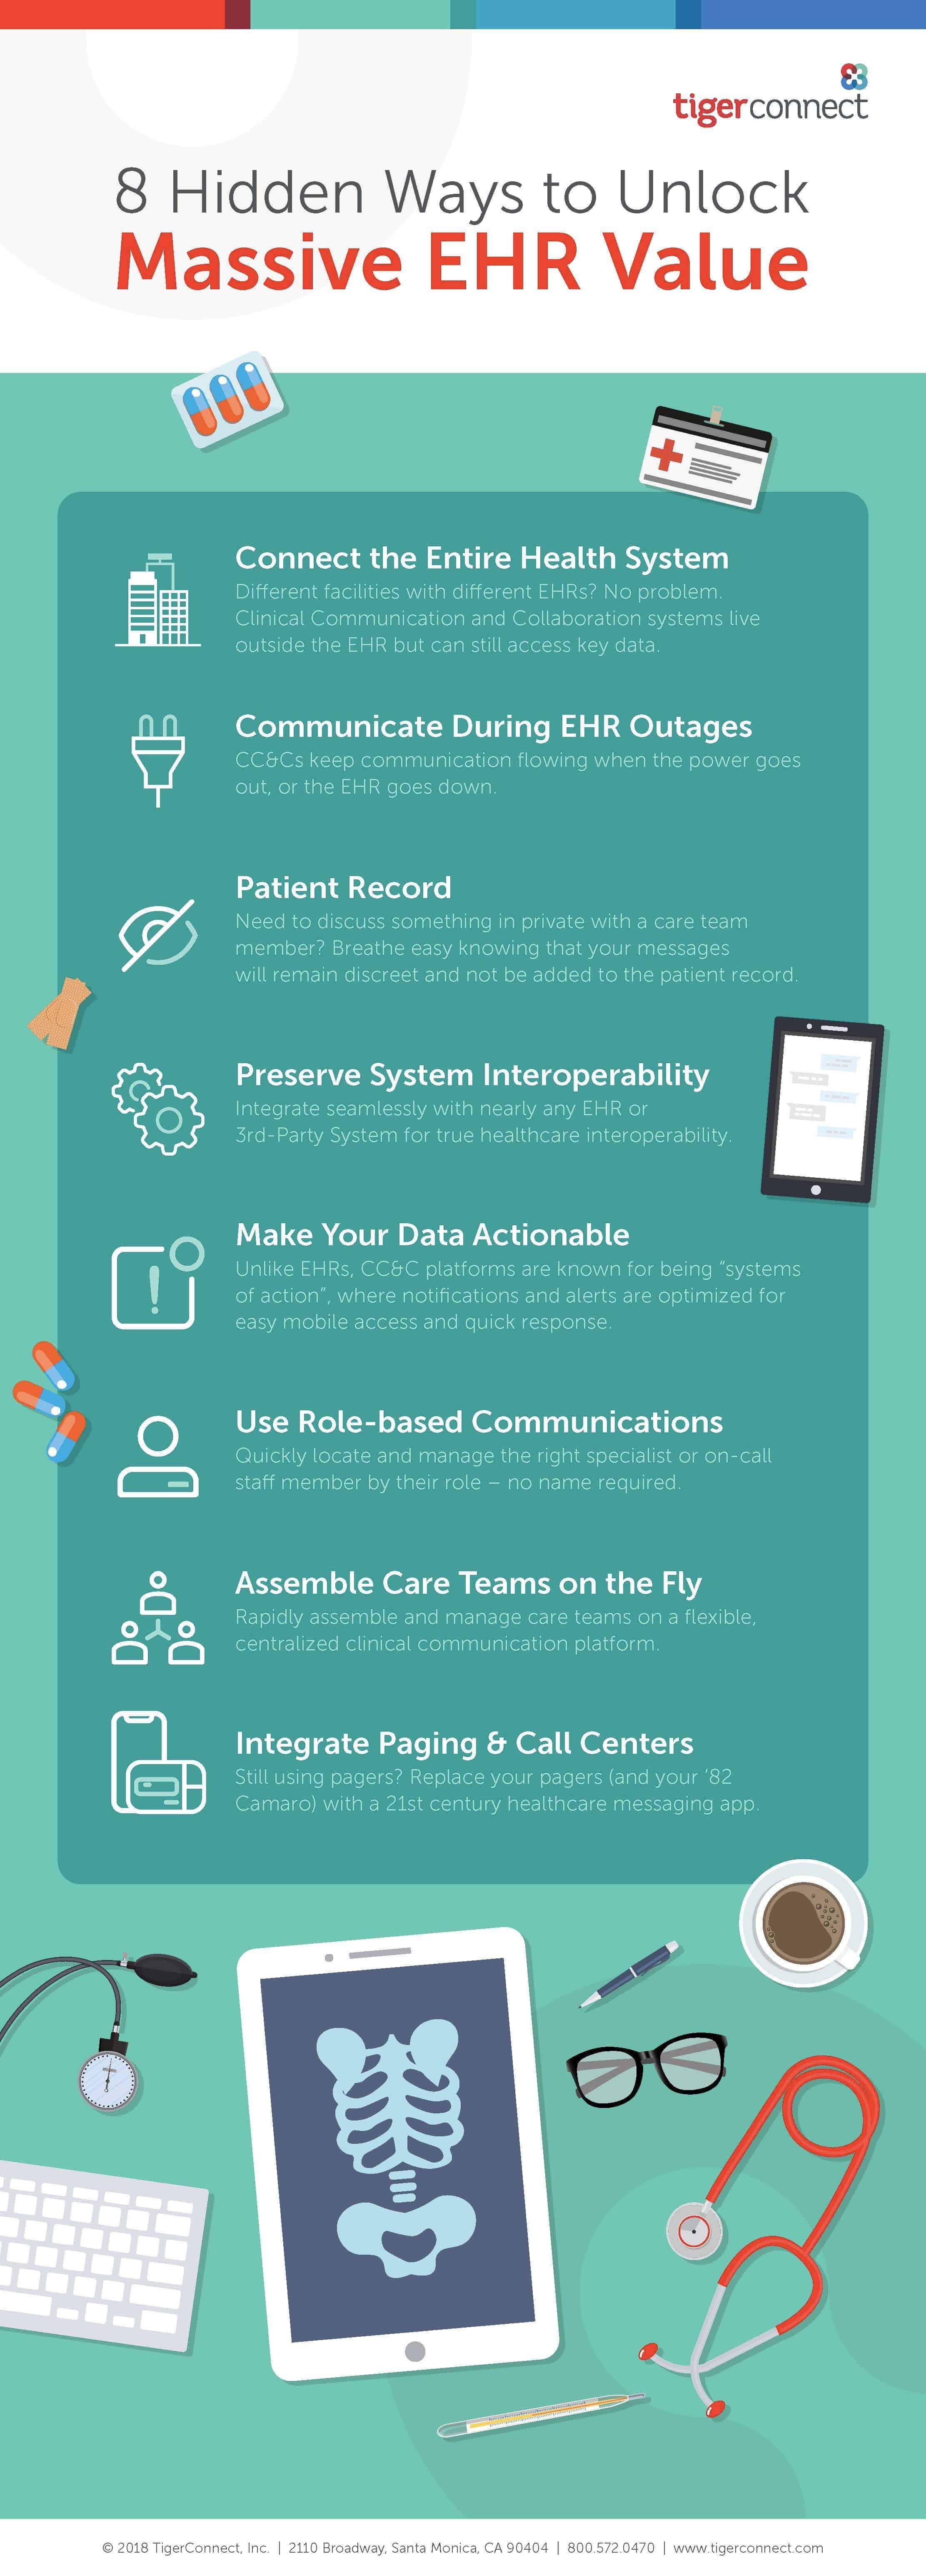 8 Hidden Ways to Unlock Massive EHR Value Infographic Preview